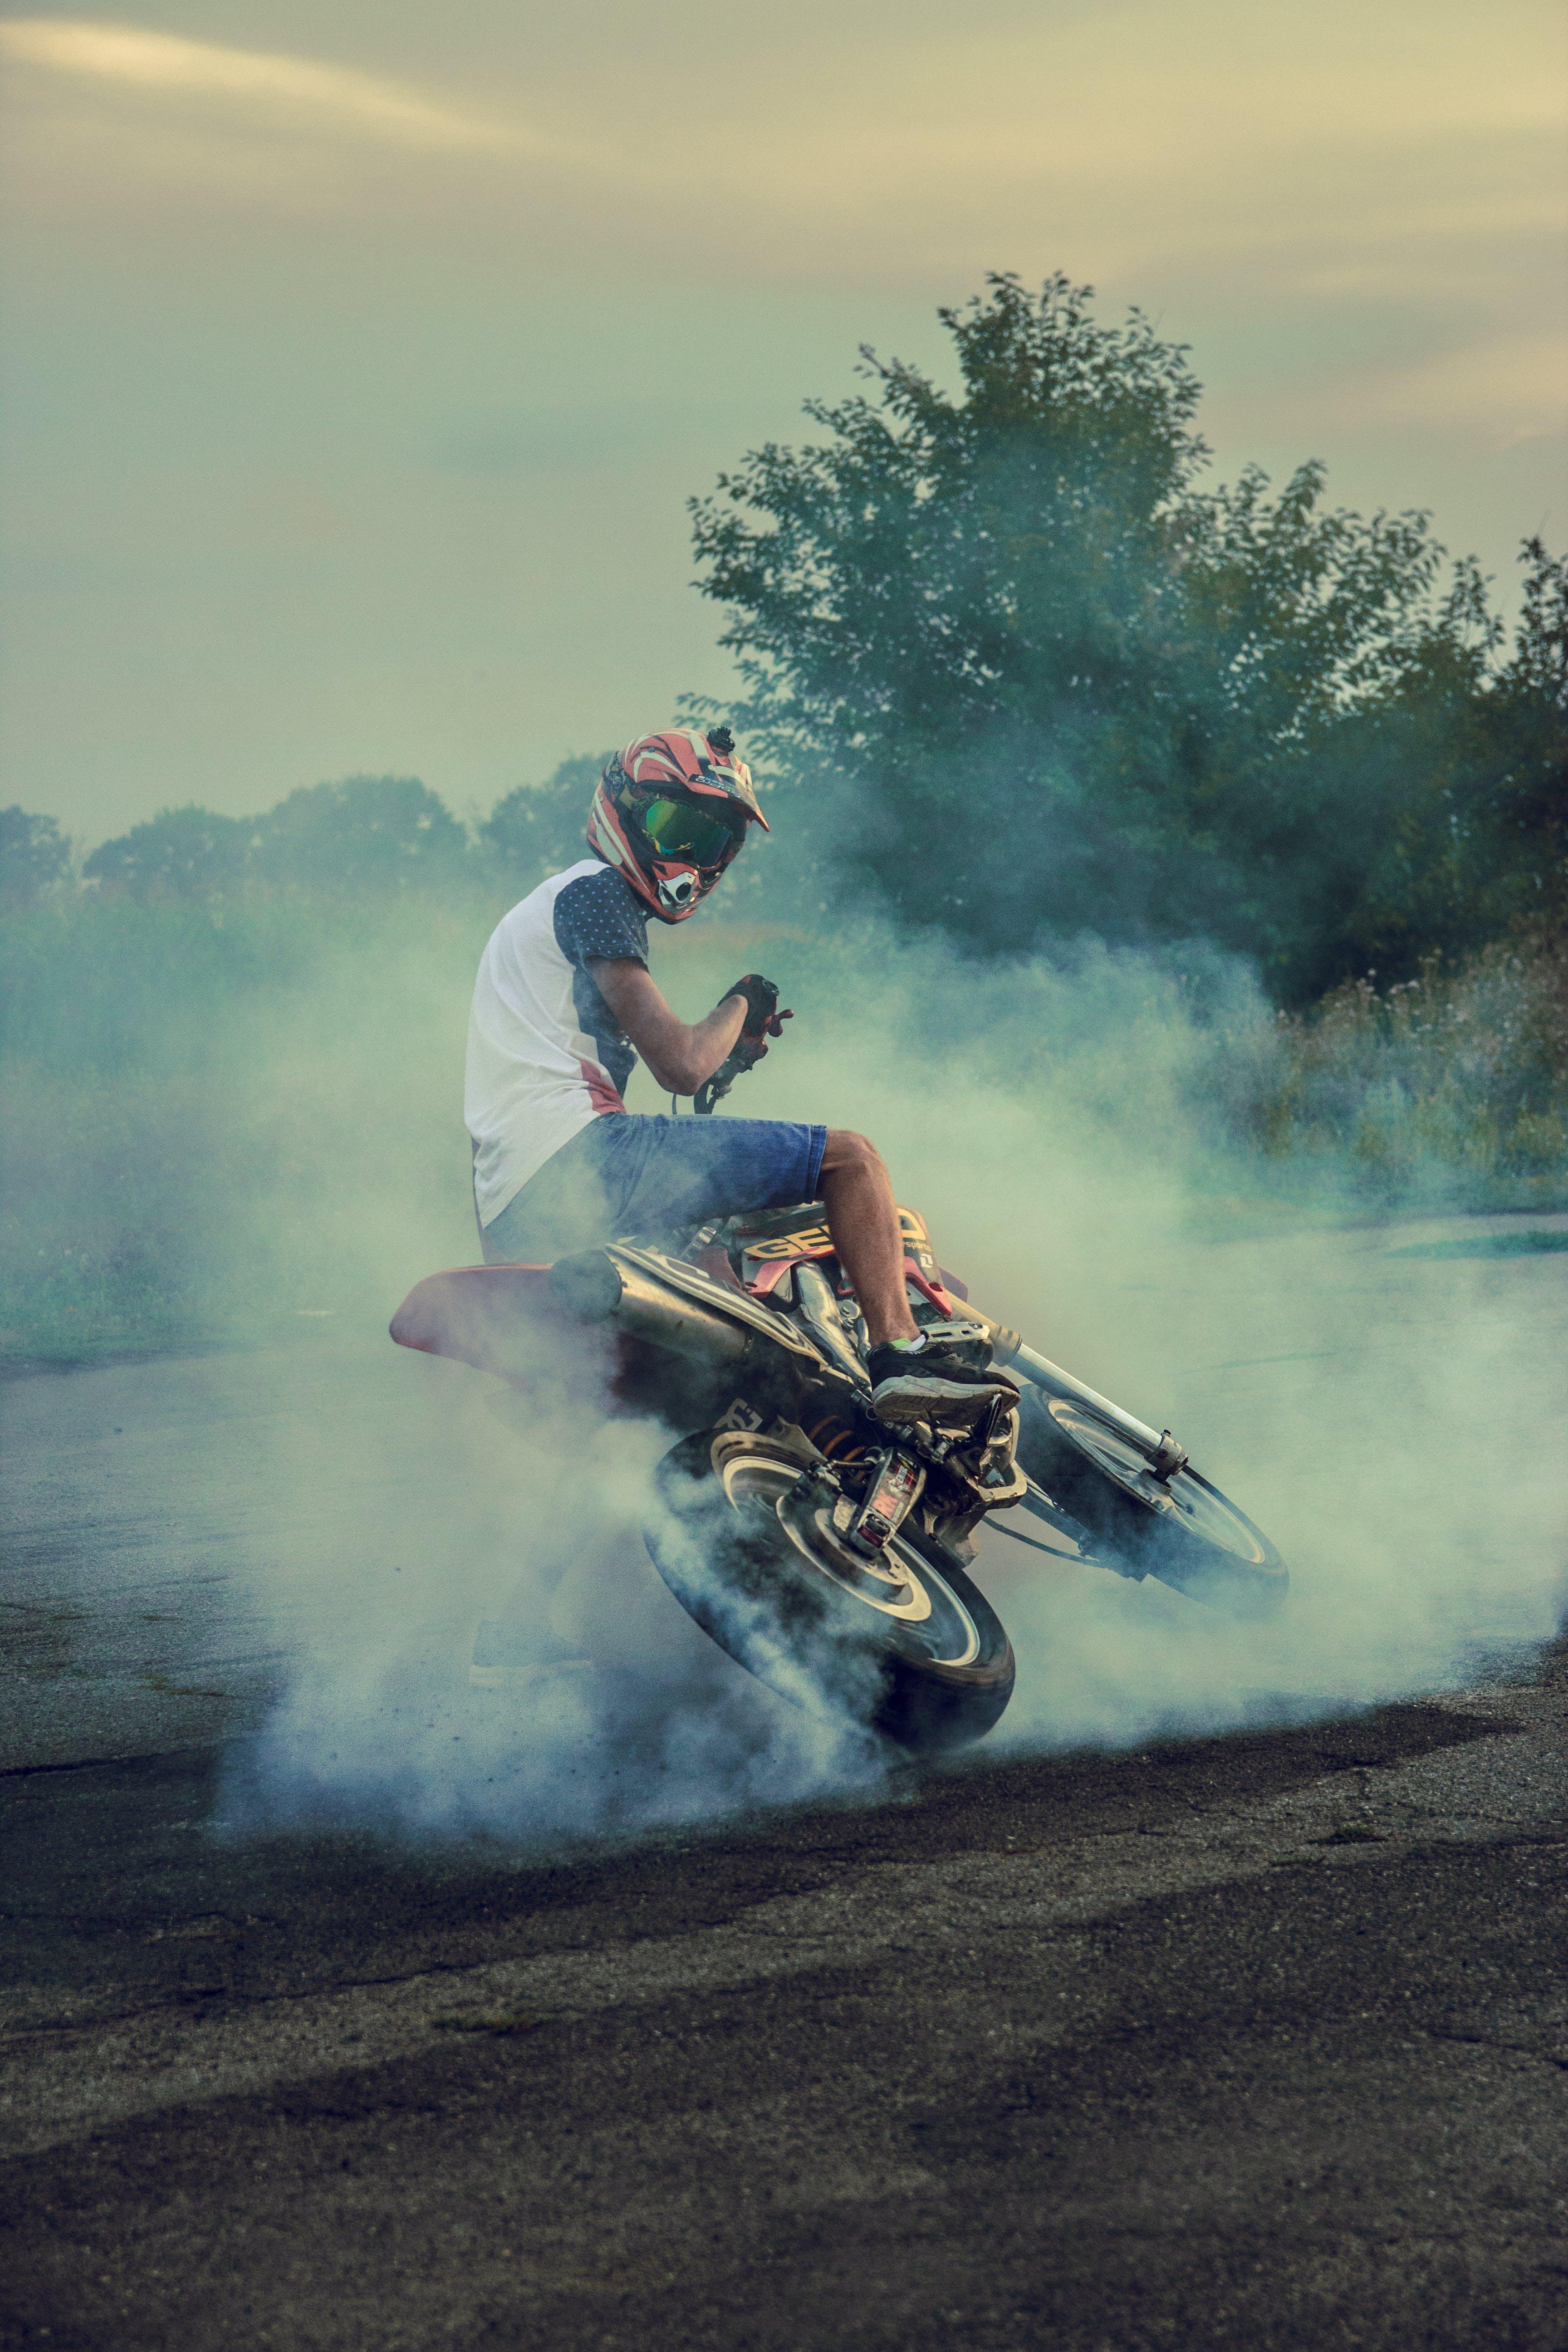 Free stock photo of moto, moto racing, motocross, motor bike